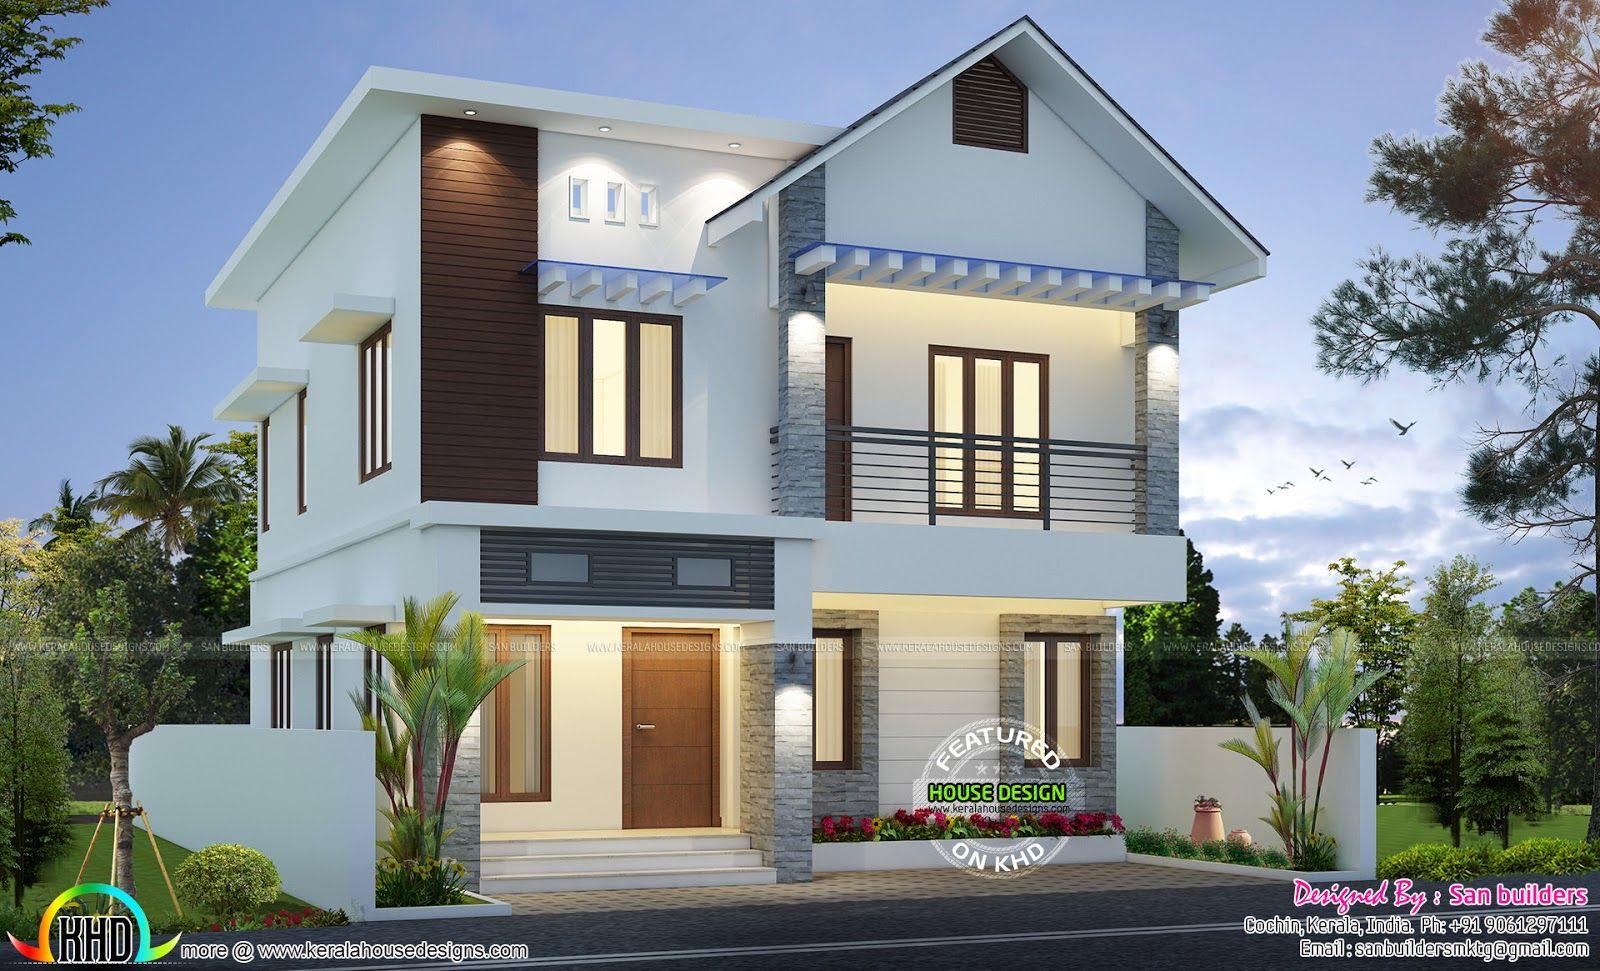 1431 sq-ft cute home plan | Kerala house design, Bungalow ...